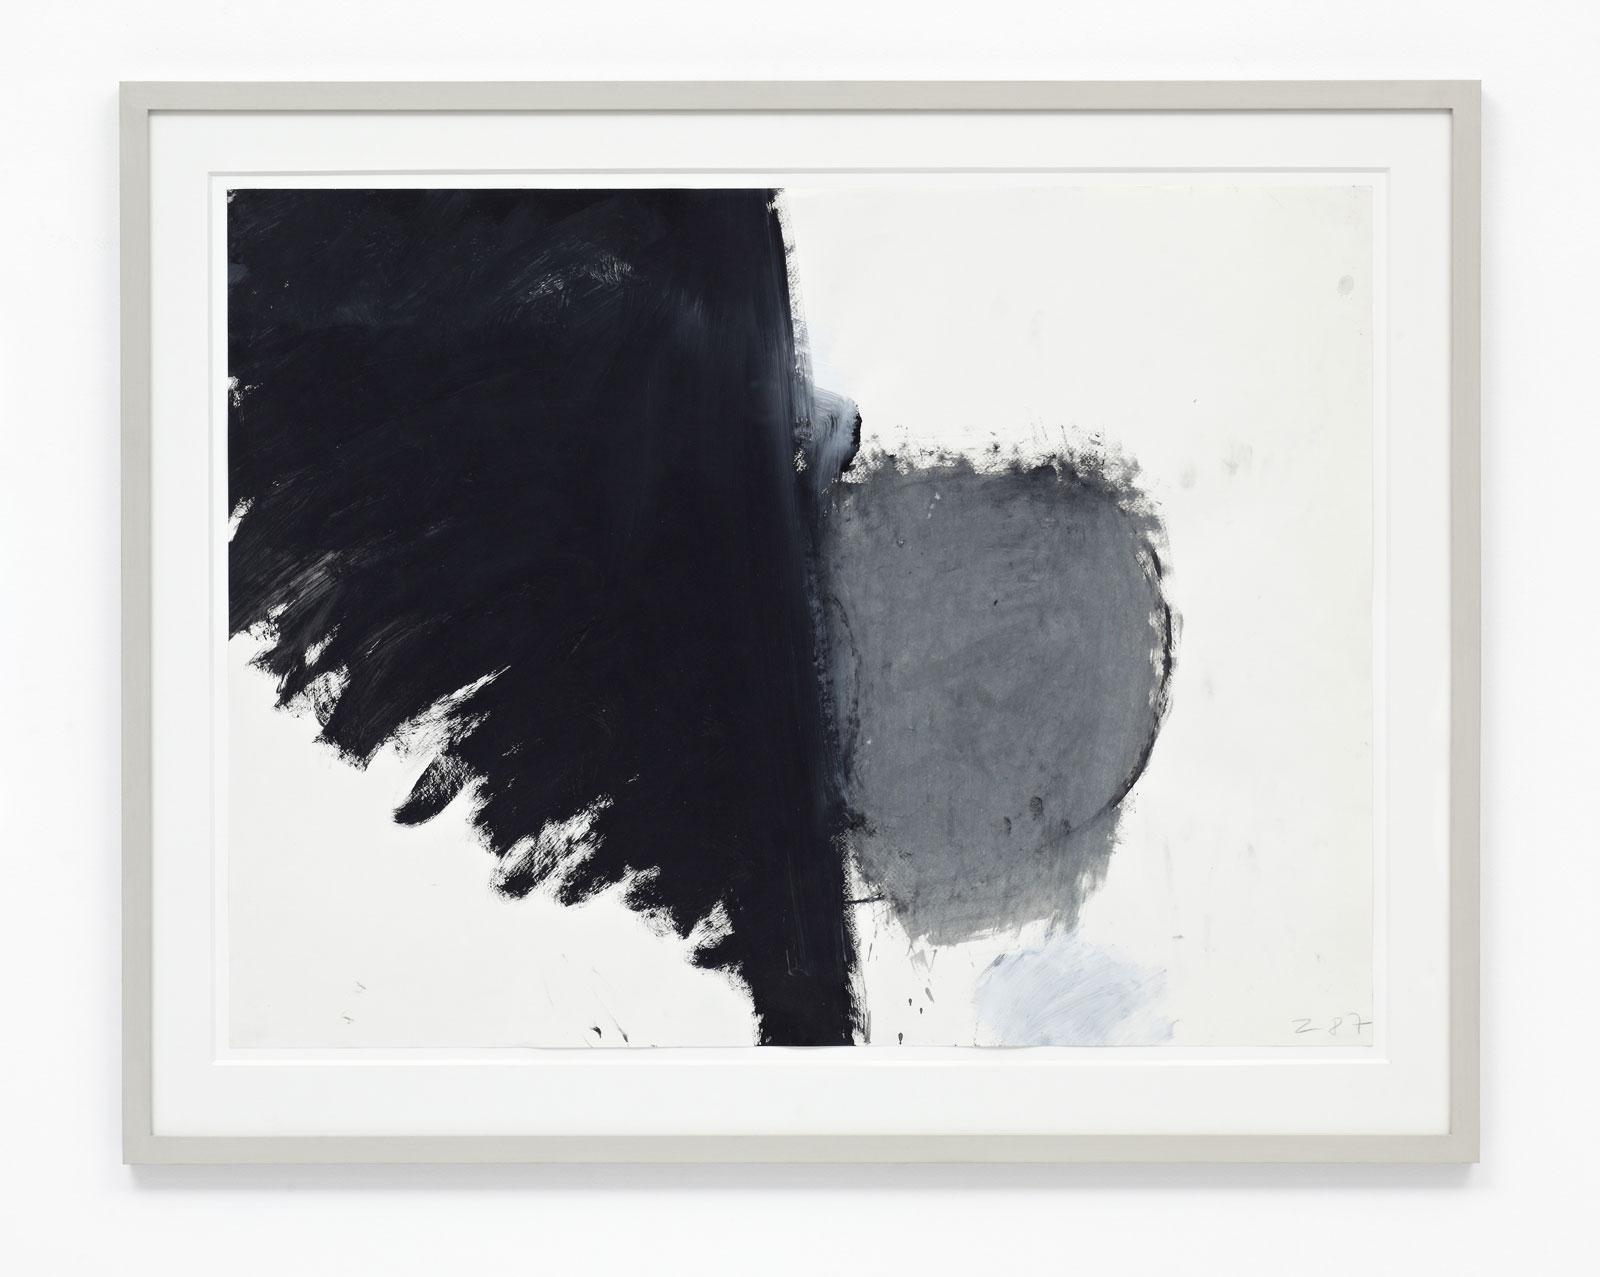 Zogmayer, Leo - o.T. (Flügel) - 1987